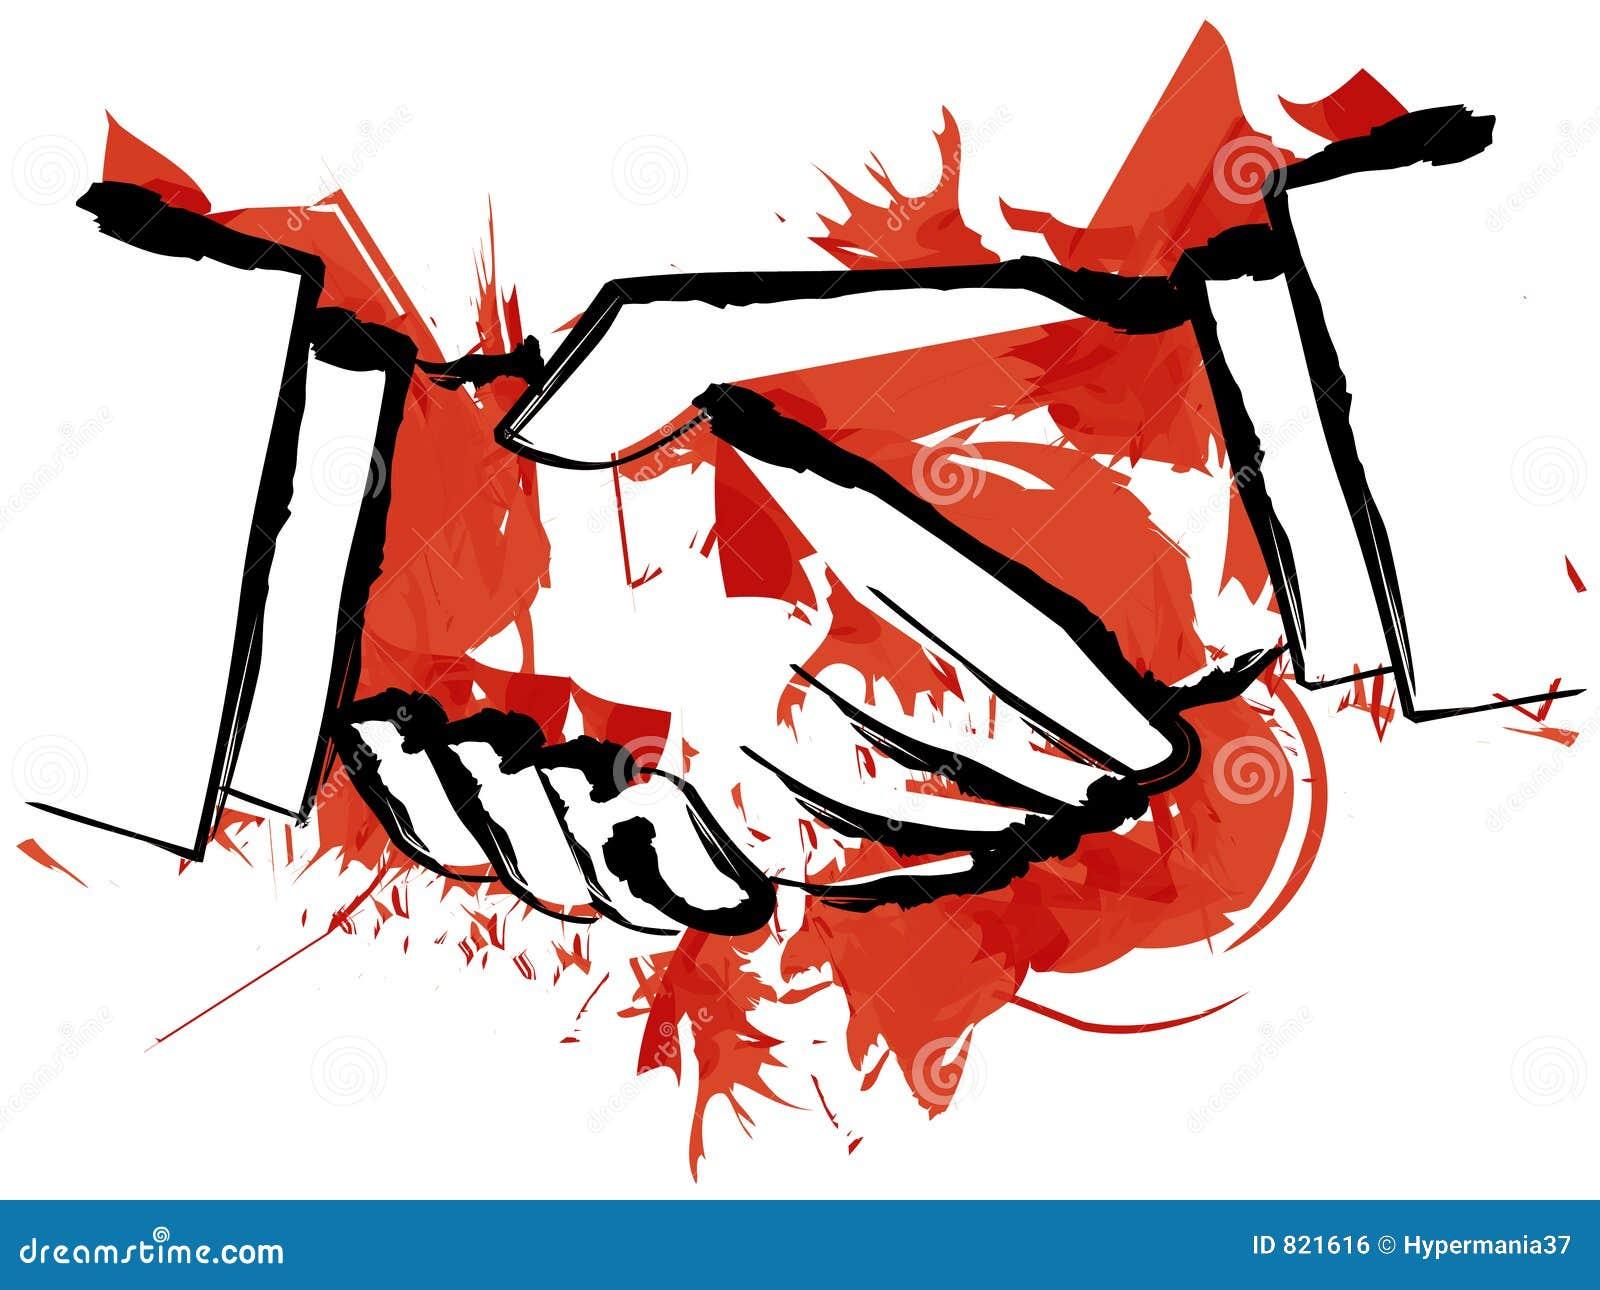 Blood Hand Shake Royalty Free Stock Image - Image: 821616